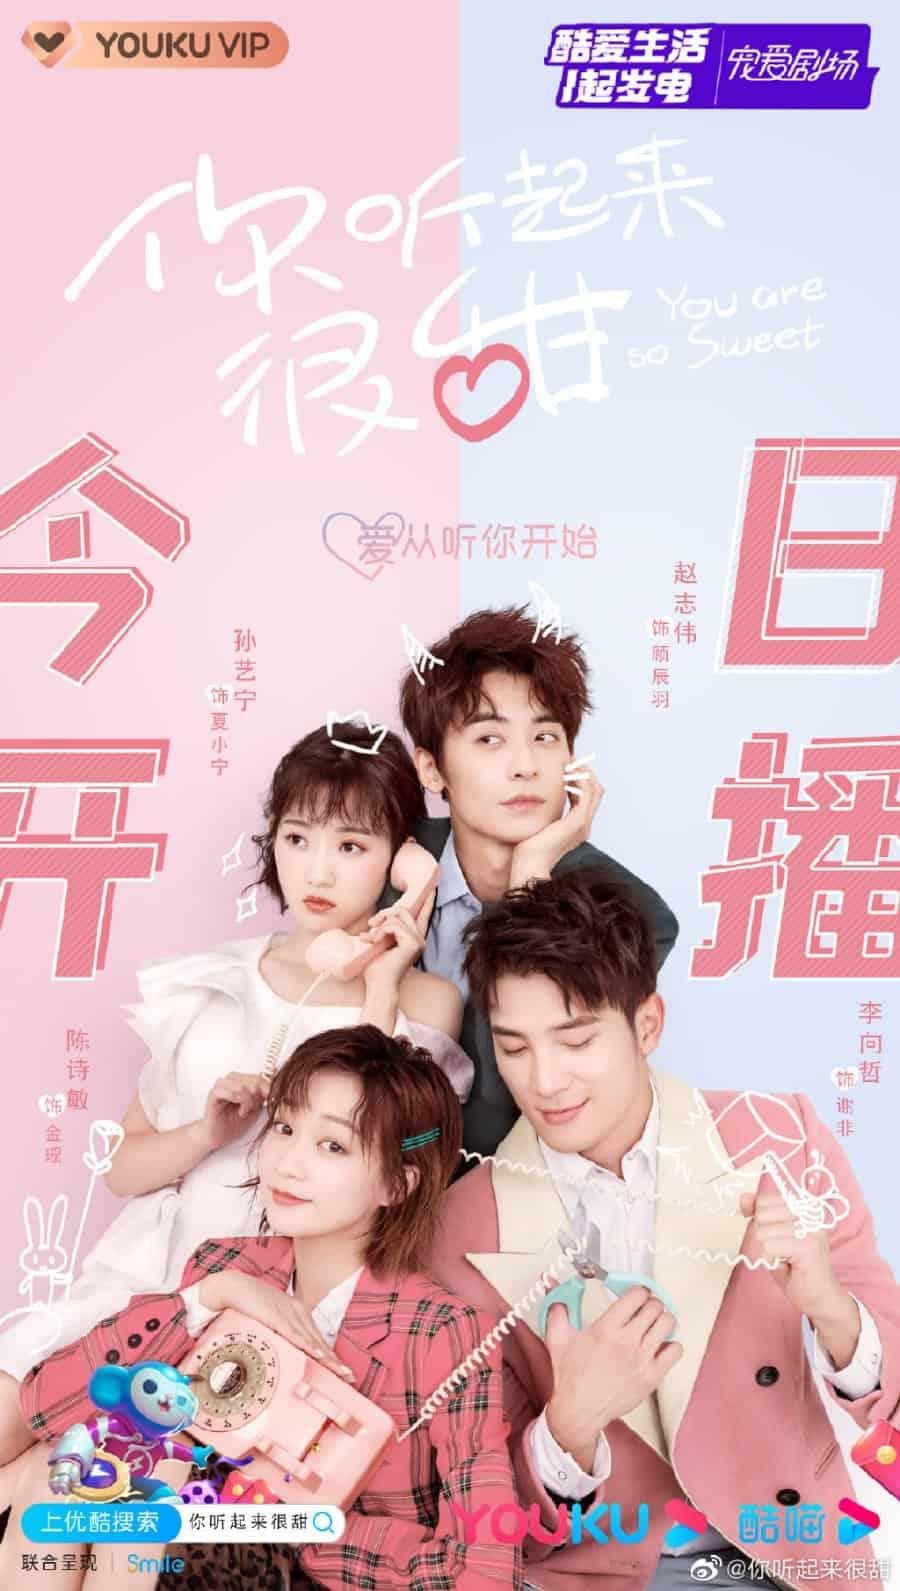 You Are So Sweet (2020) นักพากย์เสียงหวาน ซับไทย EP1 – EP4